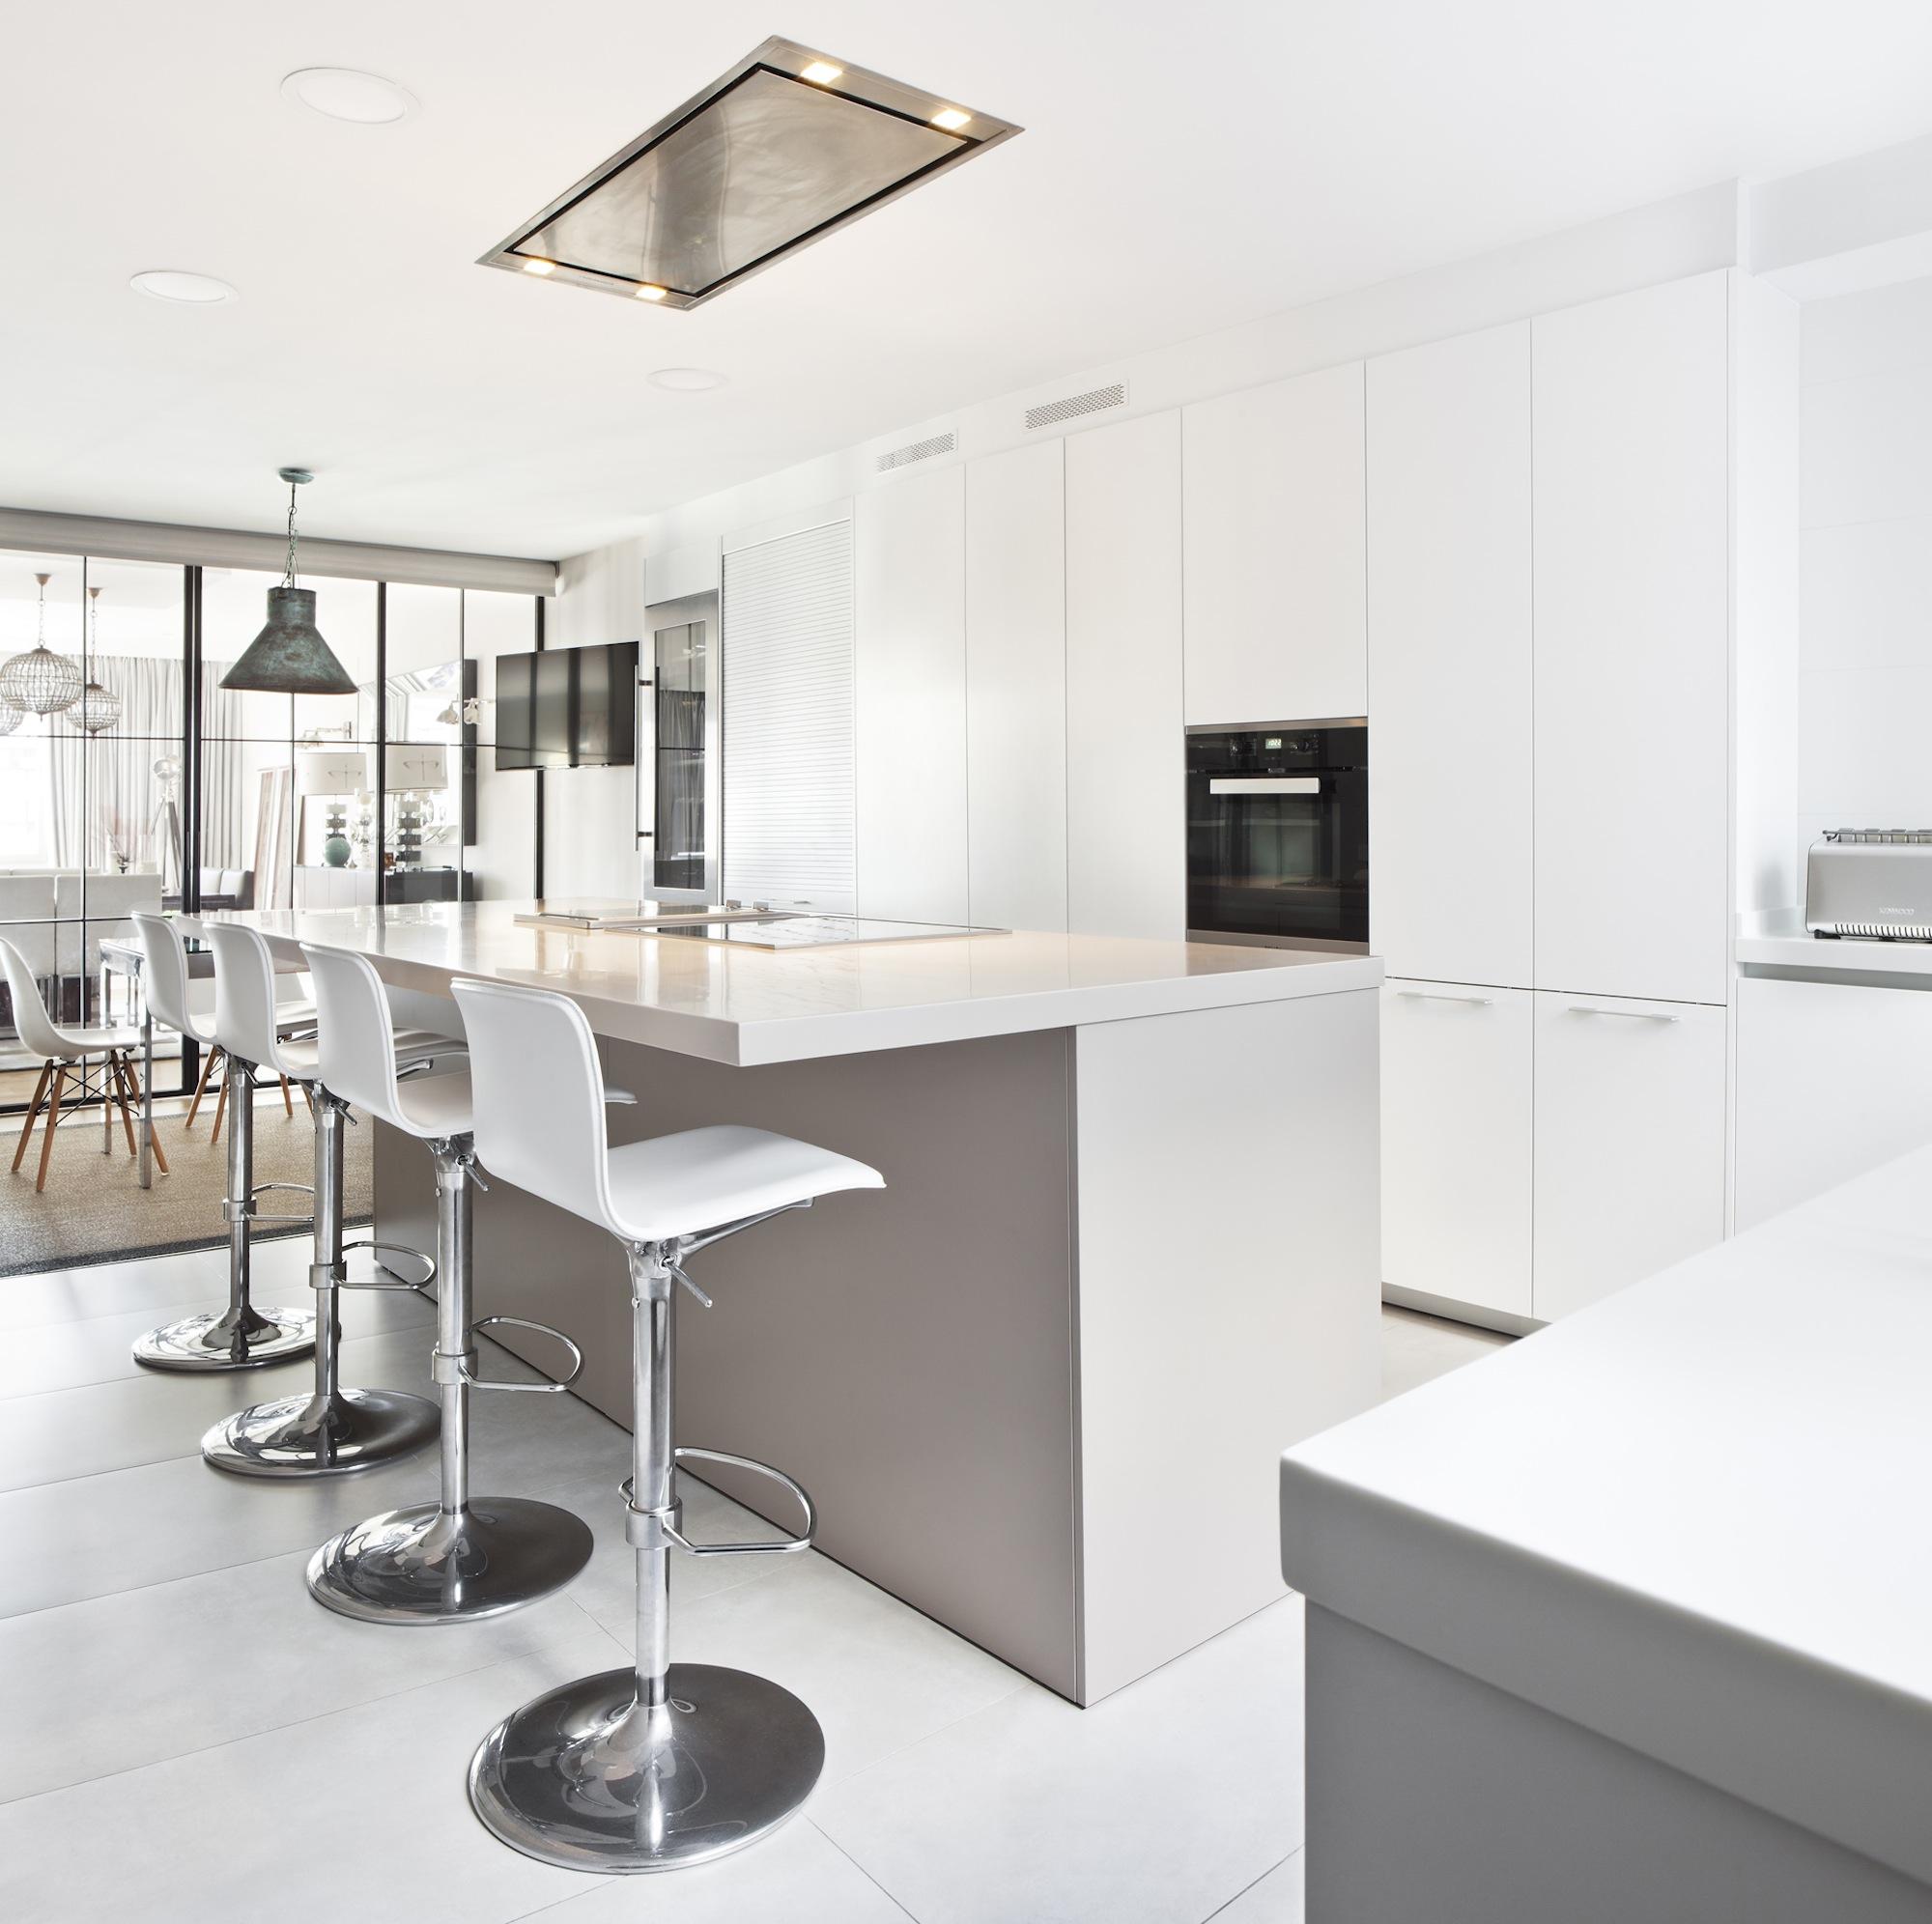 Cocina En Salon - Diseños Arquitectónicos - Mimasku.com